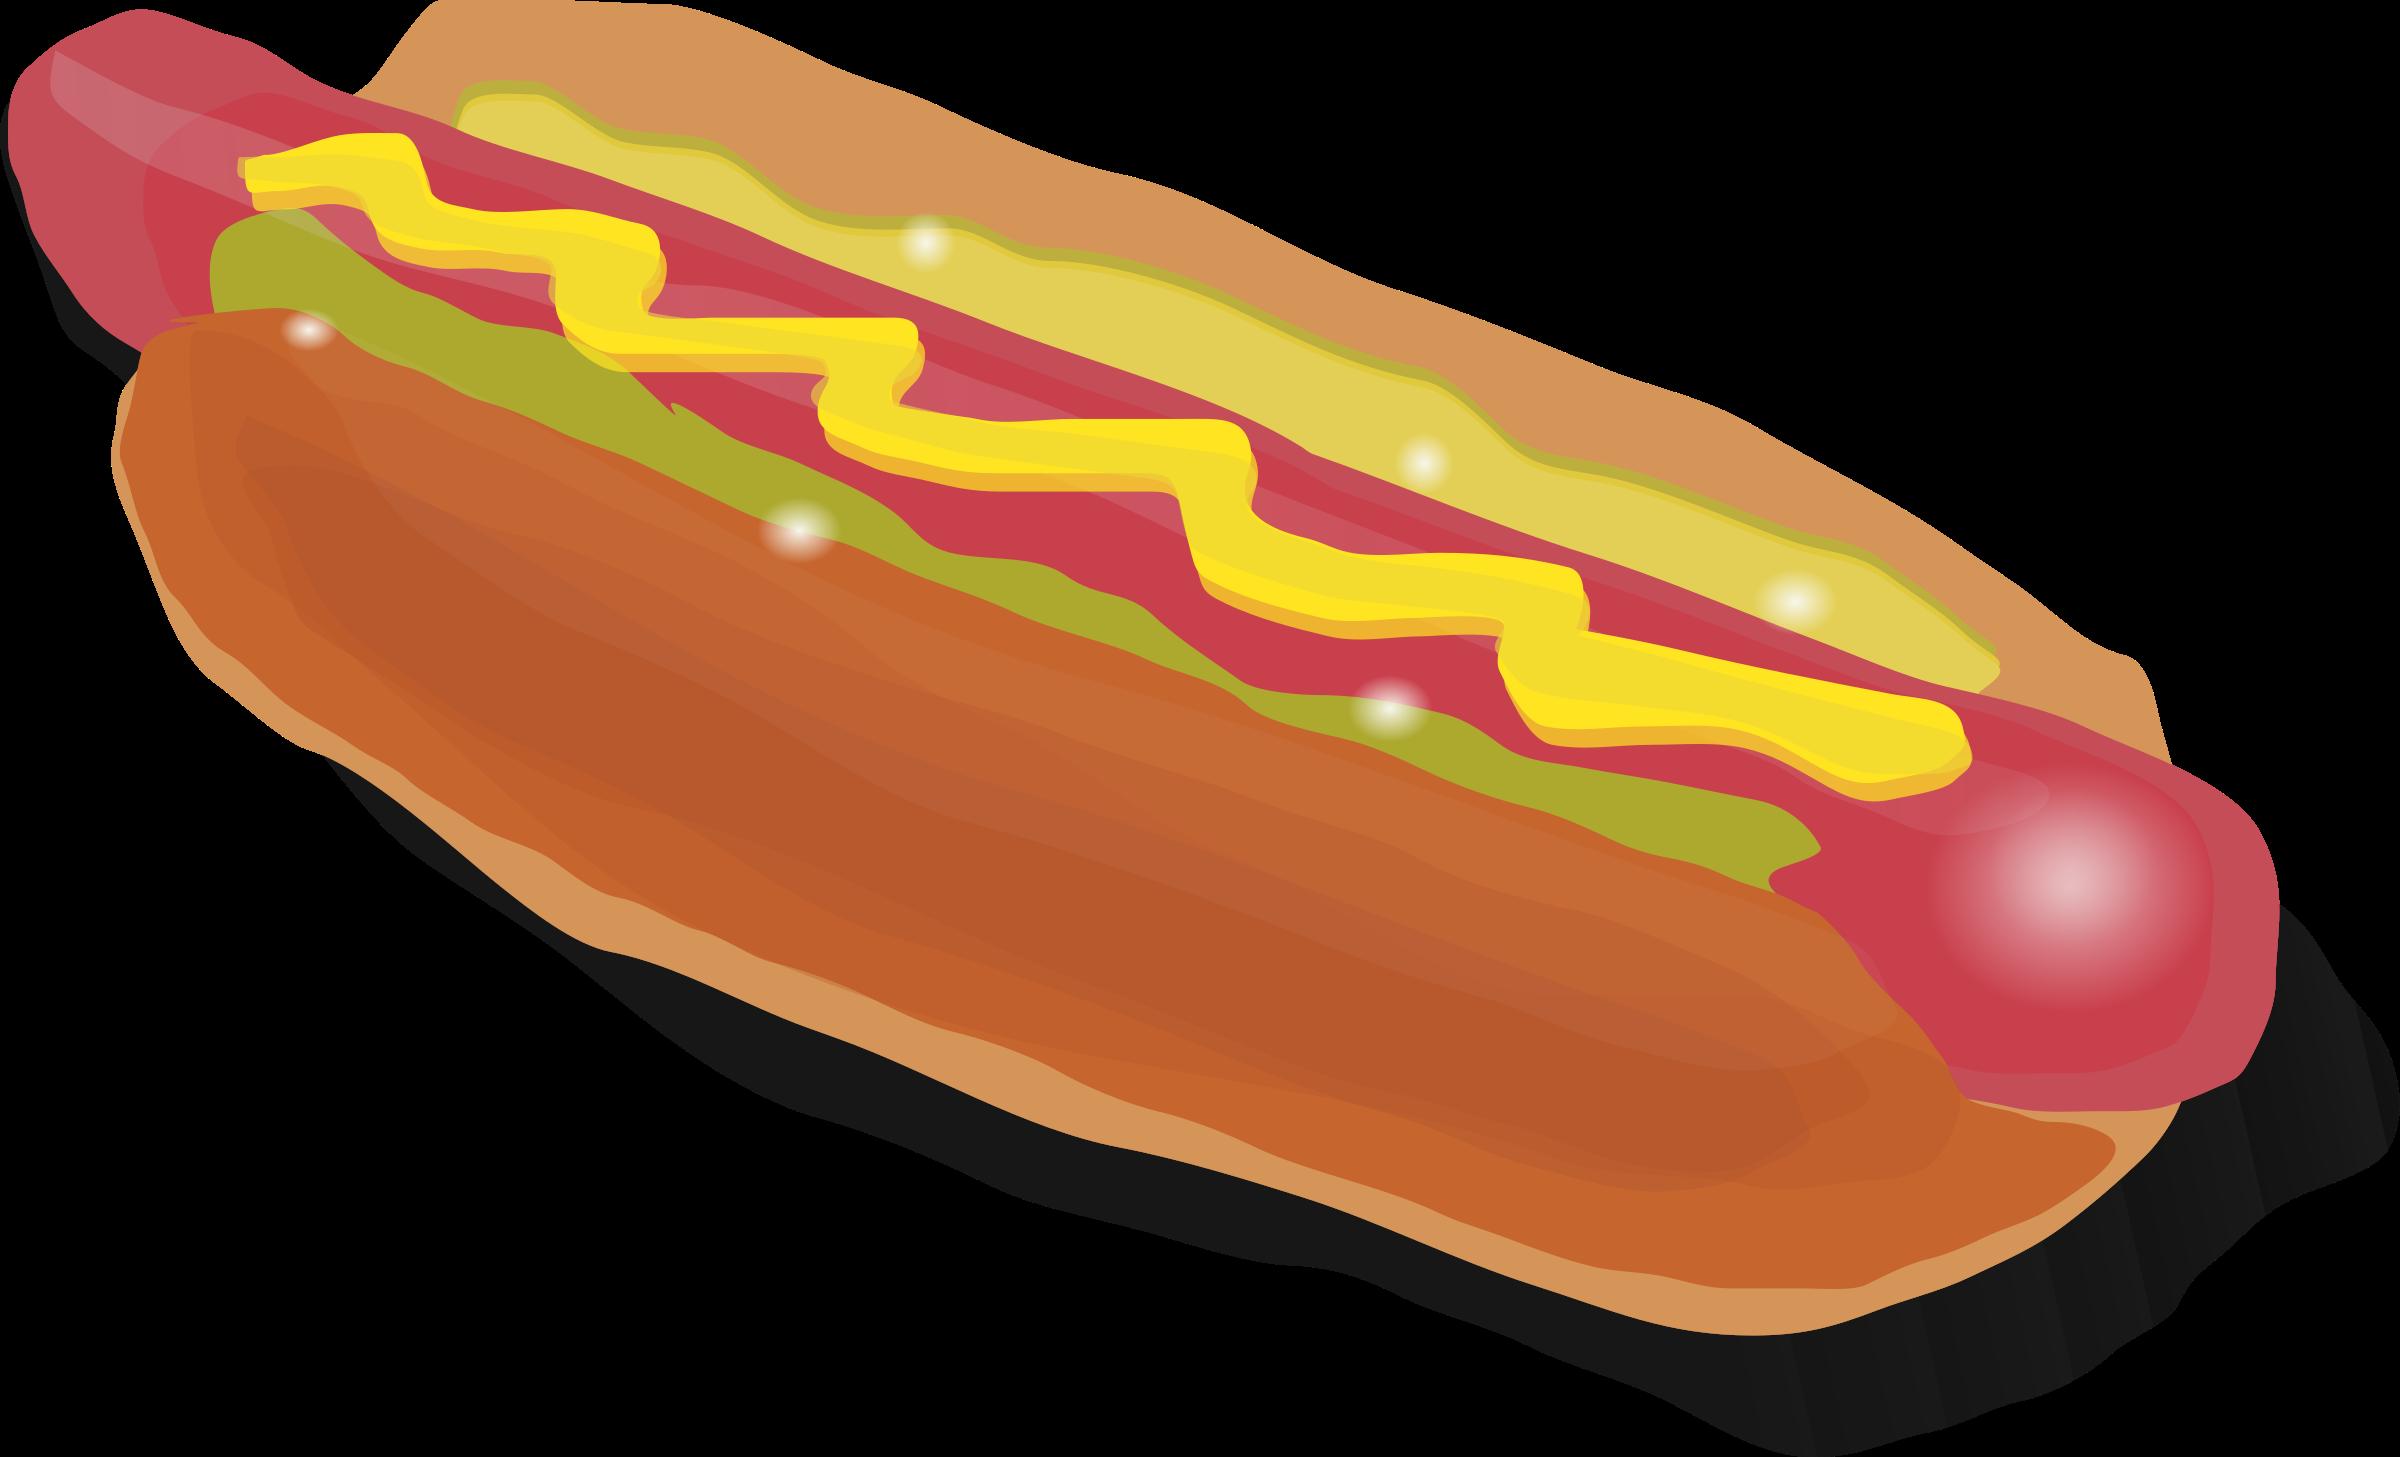 Hot dog png transparent. Jalapeno clipart clip art